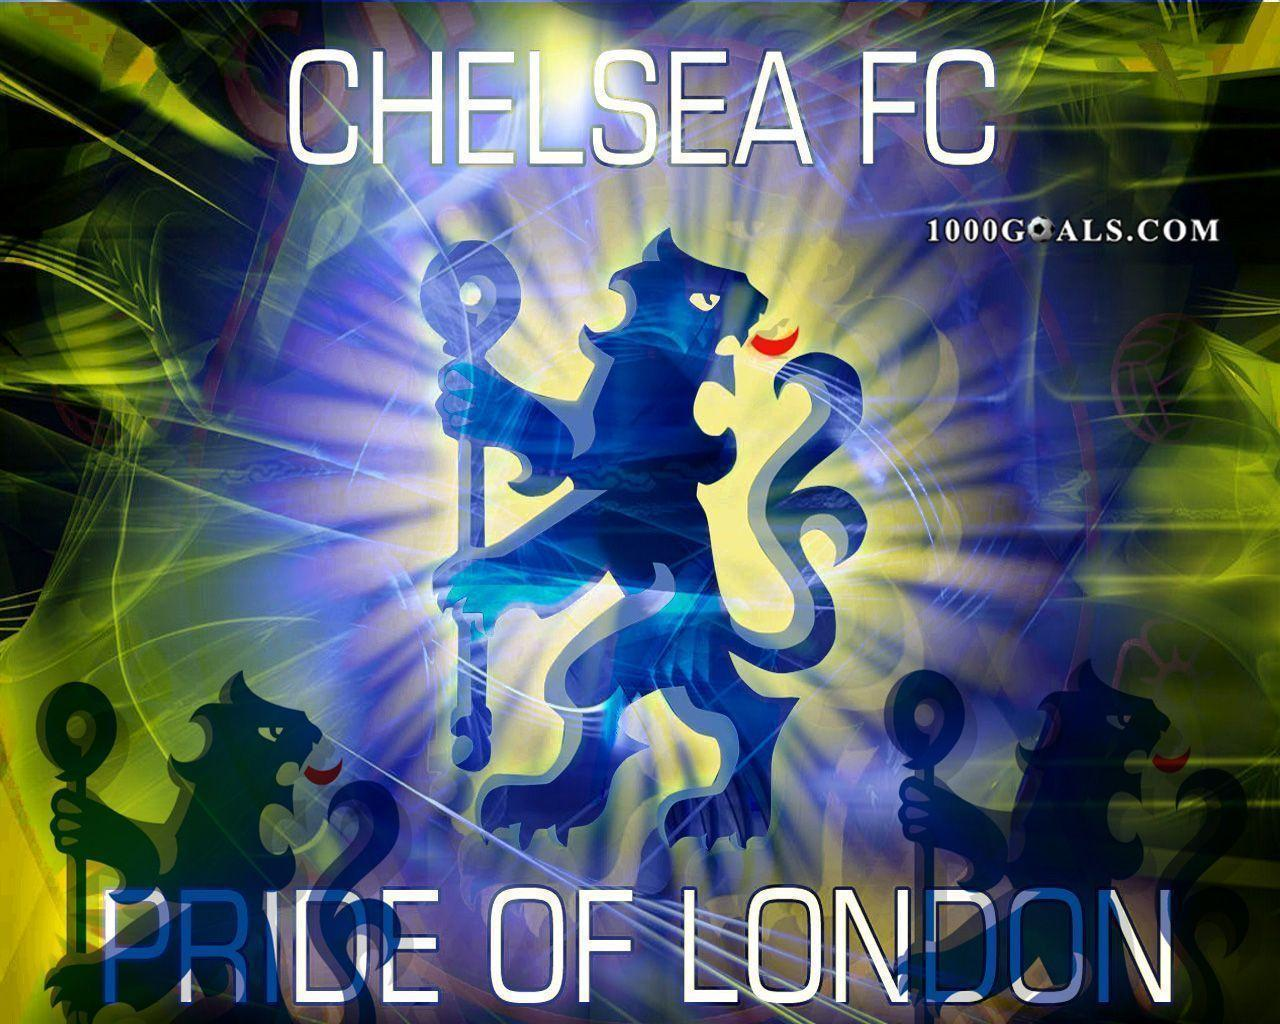 Brand new Chelsea Football Club Custom logo Image Screen High ...